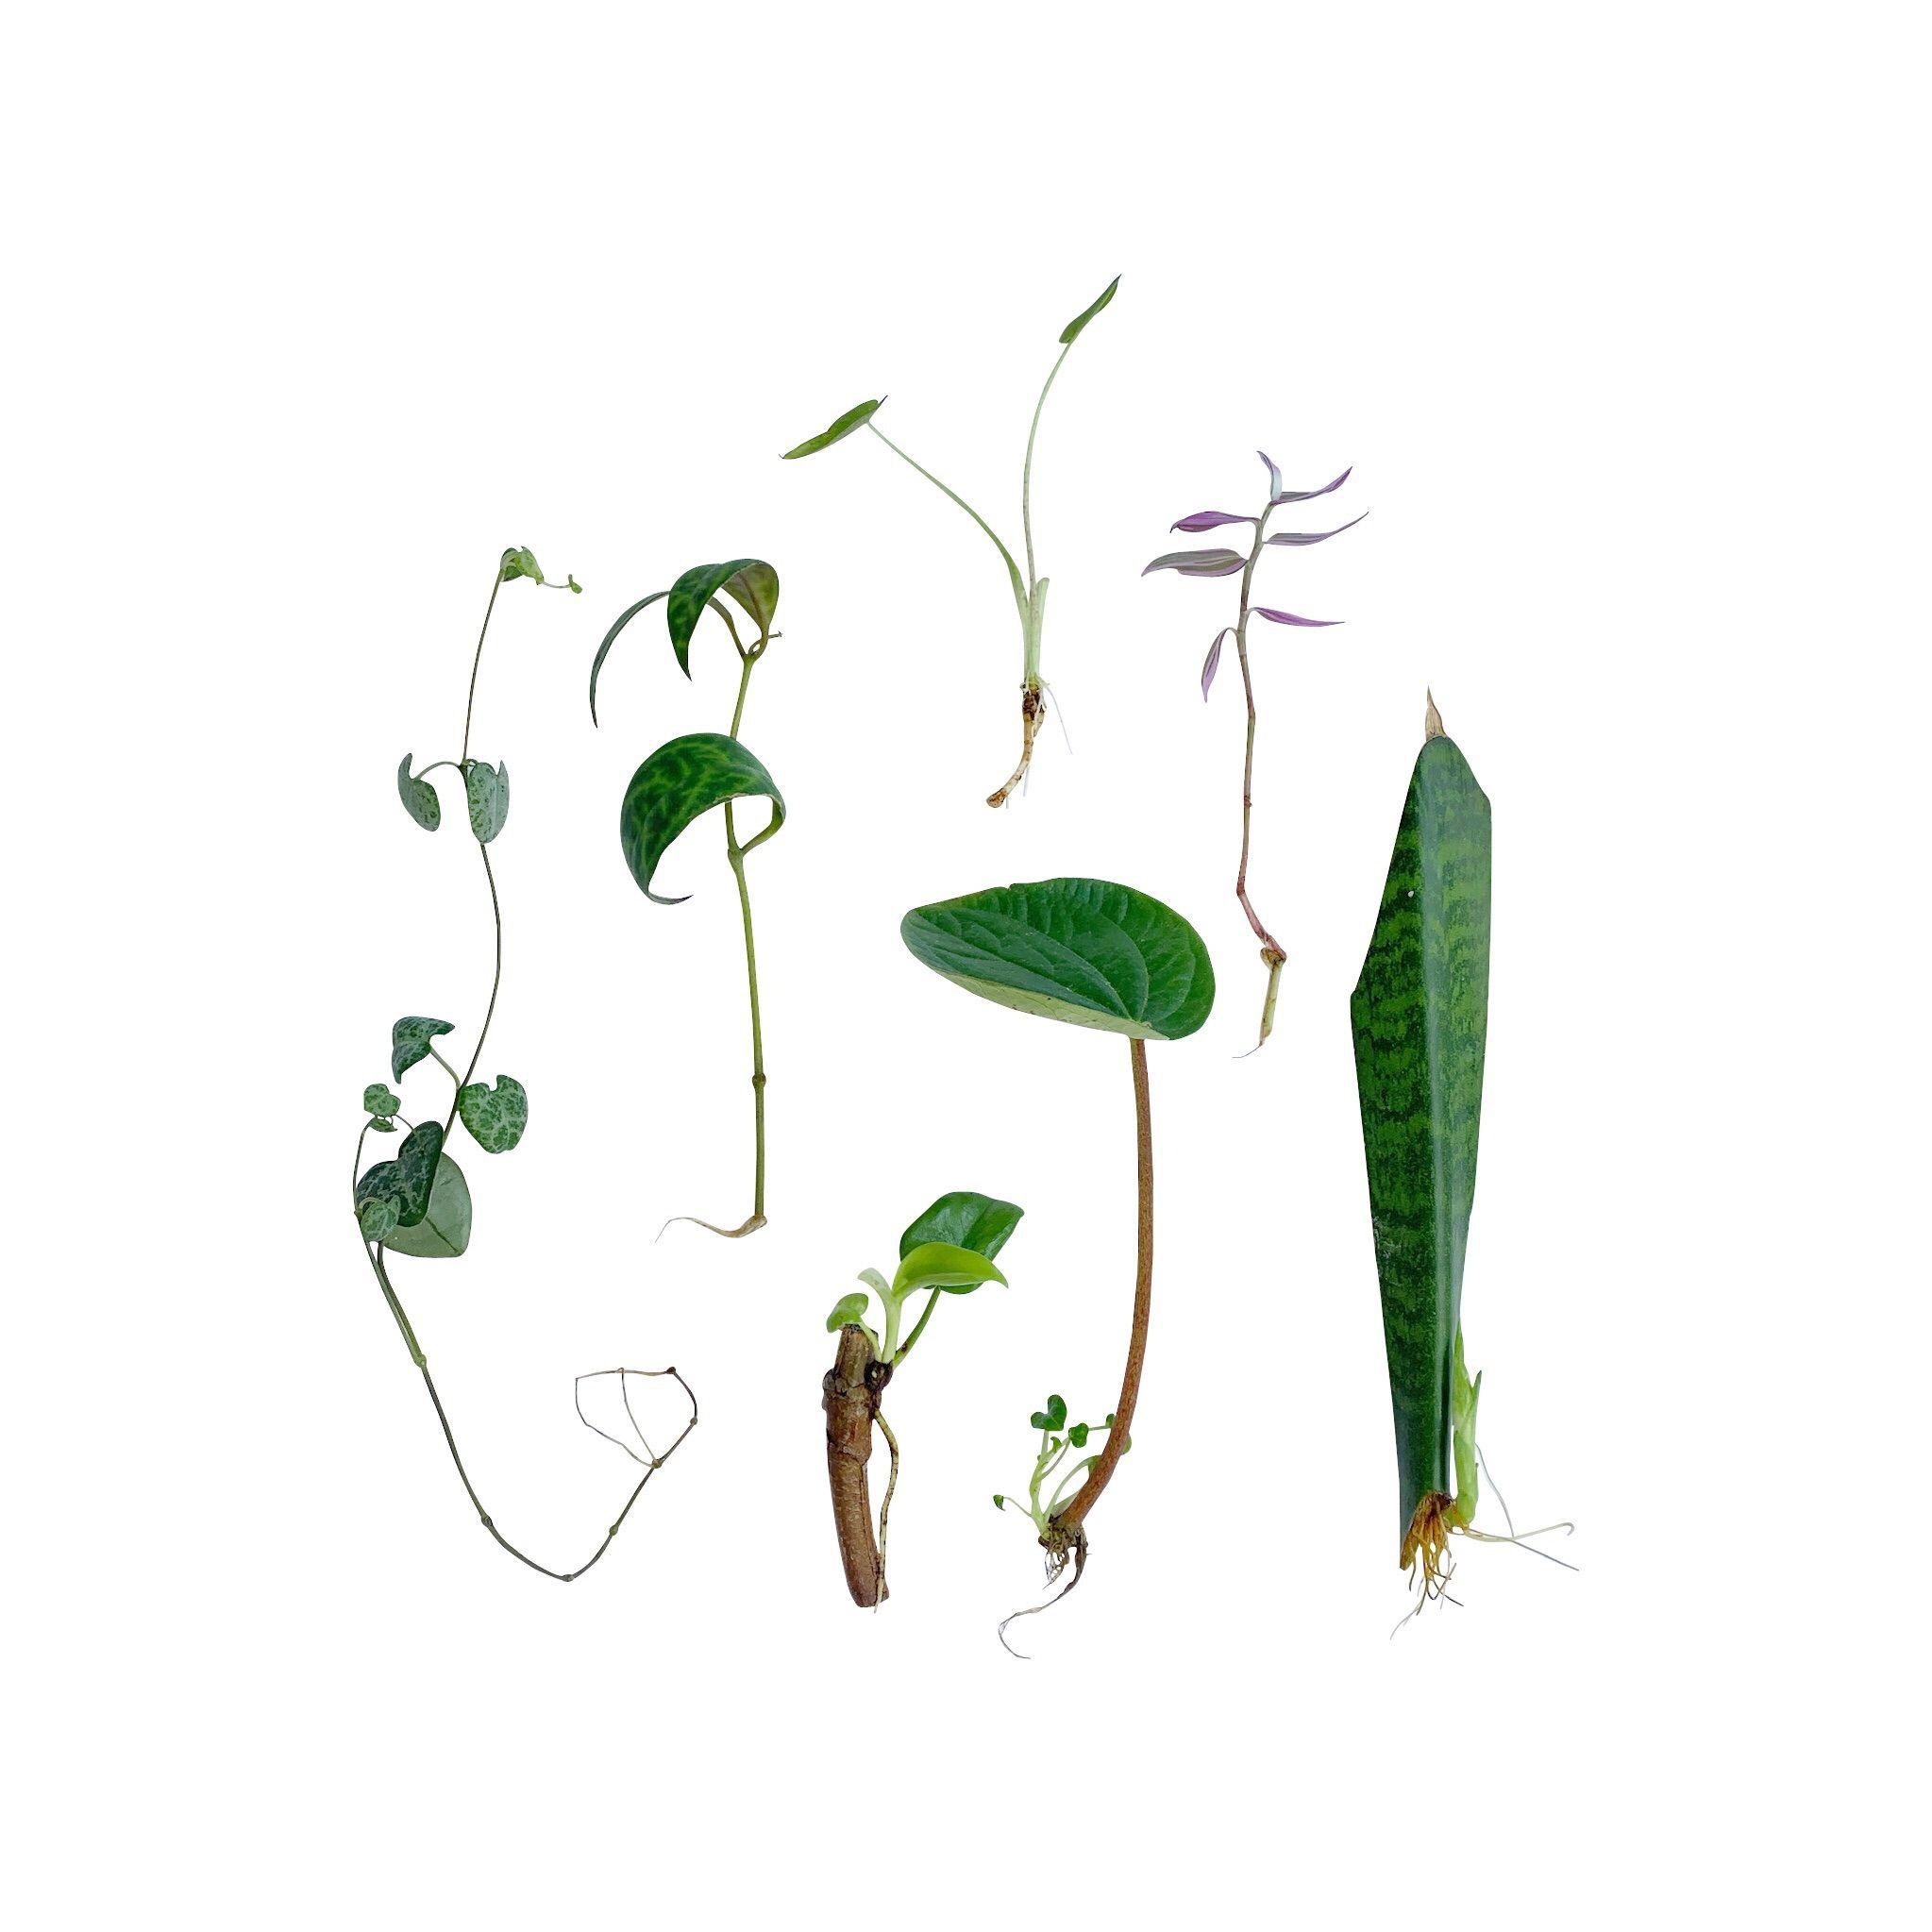 A Summer Plant & Cutting Swap in LA's Art District #DTLA #losangeles #LAworkshop #plantswap #swap #propagate #currentlypropagating #propagation #propagating #Planttrade #cuttings #tradeplants #houseplantcommunity #plantenabler #talkplantytome #plantfriends #plantcommunity #indoorplants  #houseplants #houseplantplantclub #plantcommunity #plantparenthood #planthoarder #flauntyourleaves  #coolplantkids #plantsmakepeoplehappy #urbanjunglebloggers #apartmenttherapy #iplanteven